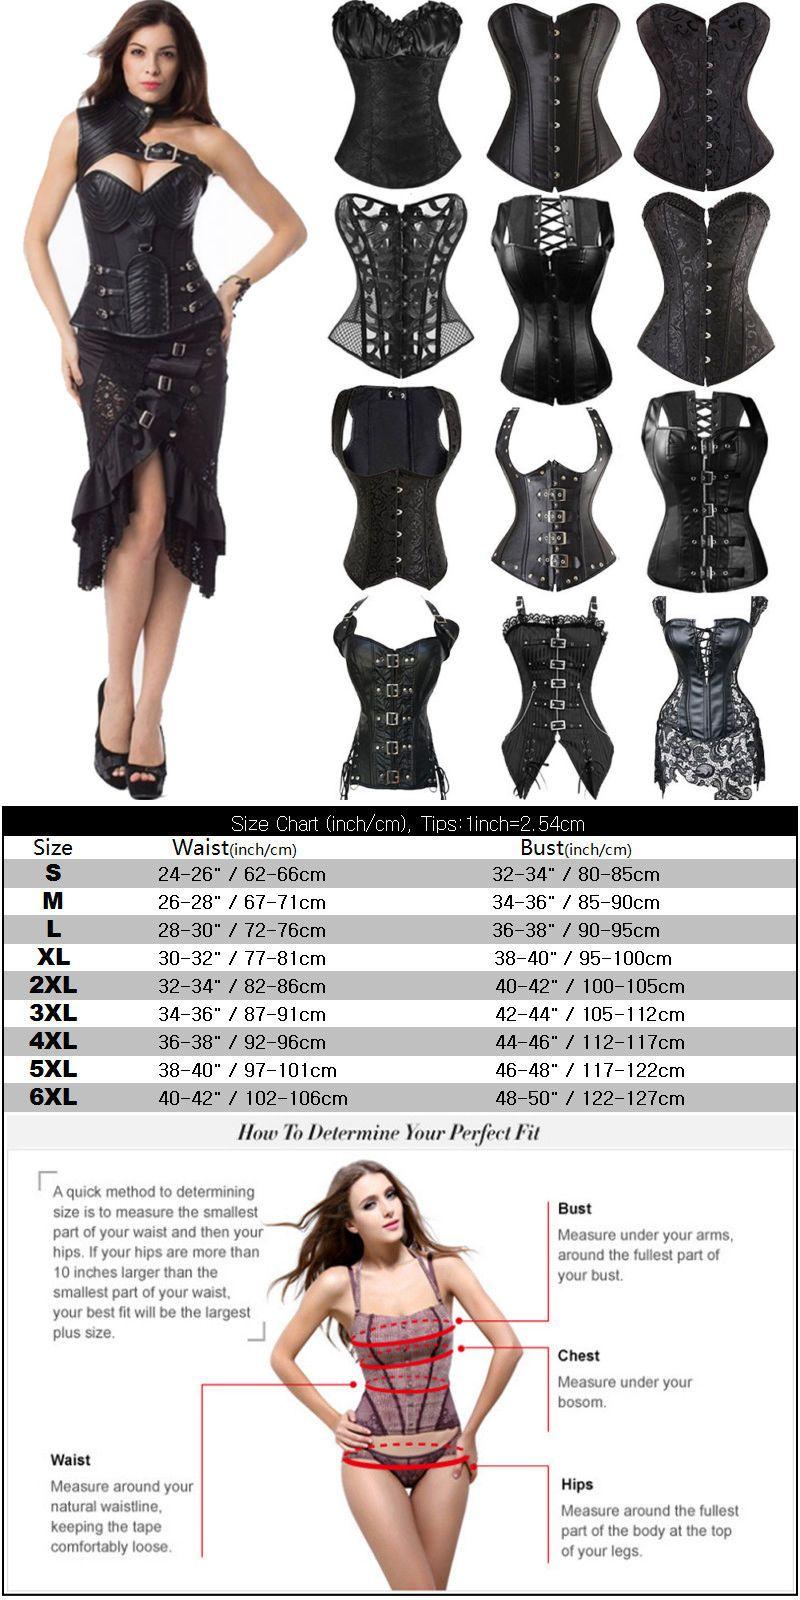 c4283f7def0 Shapewear 11530: Us Women Corset Bustier Top Lace Up Waist Training ...